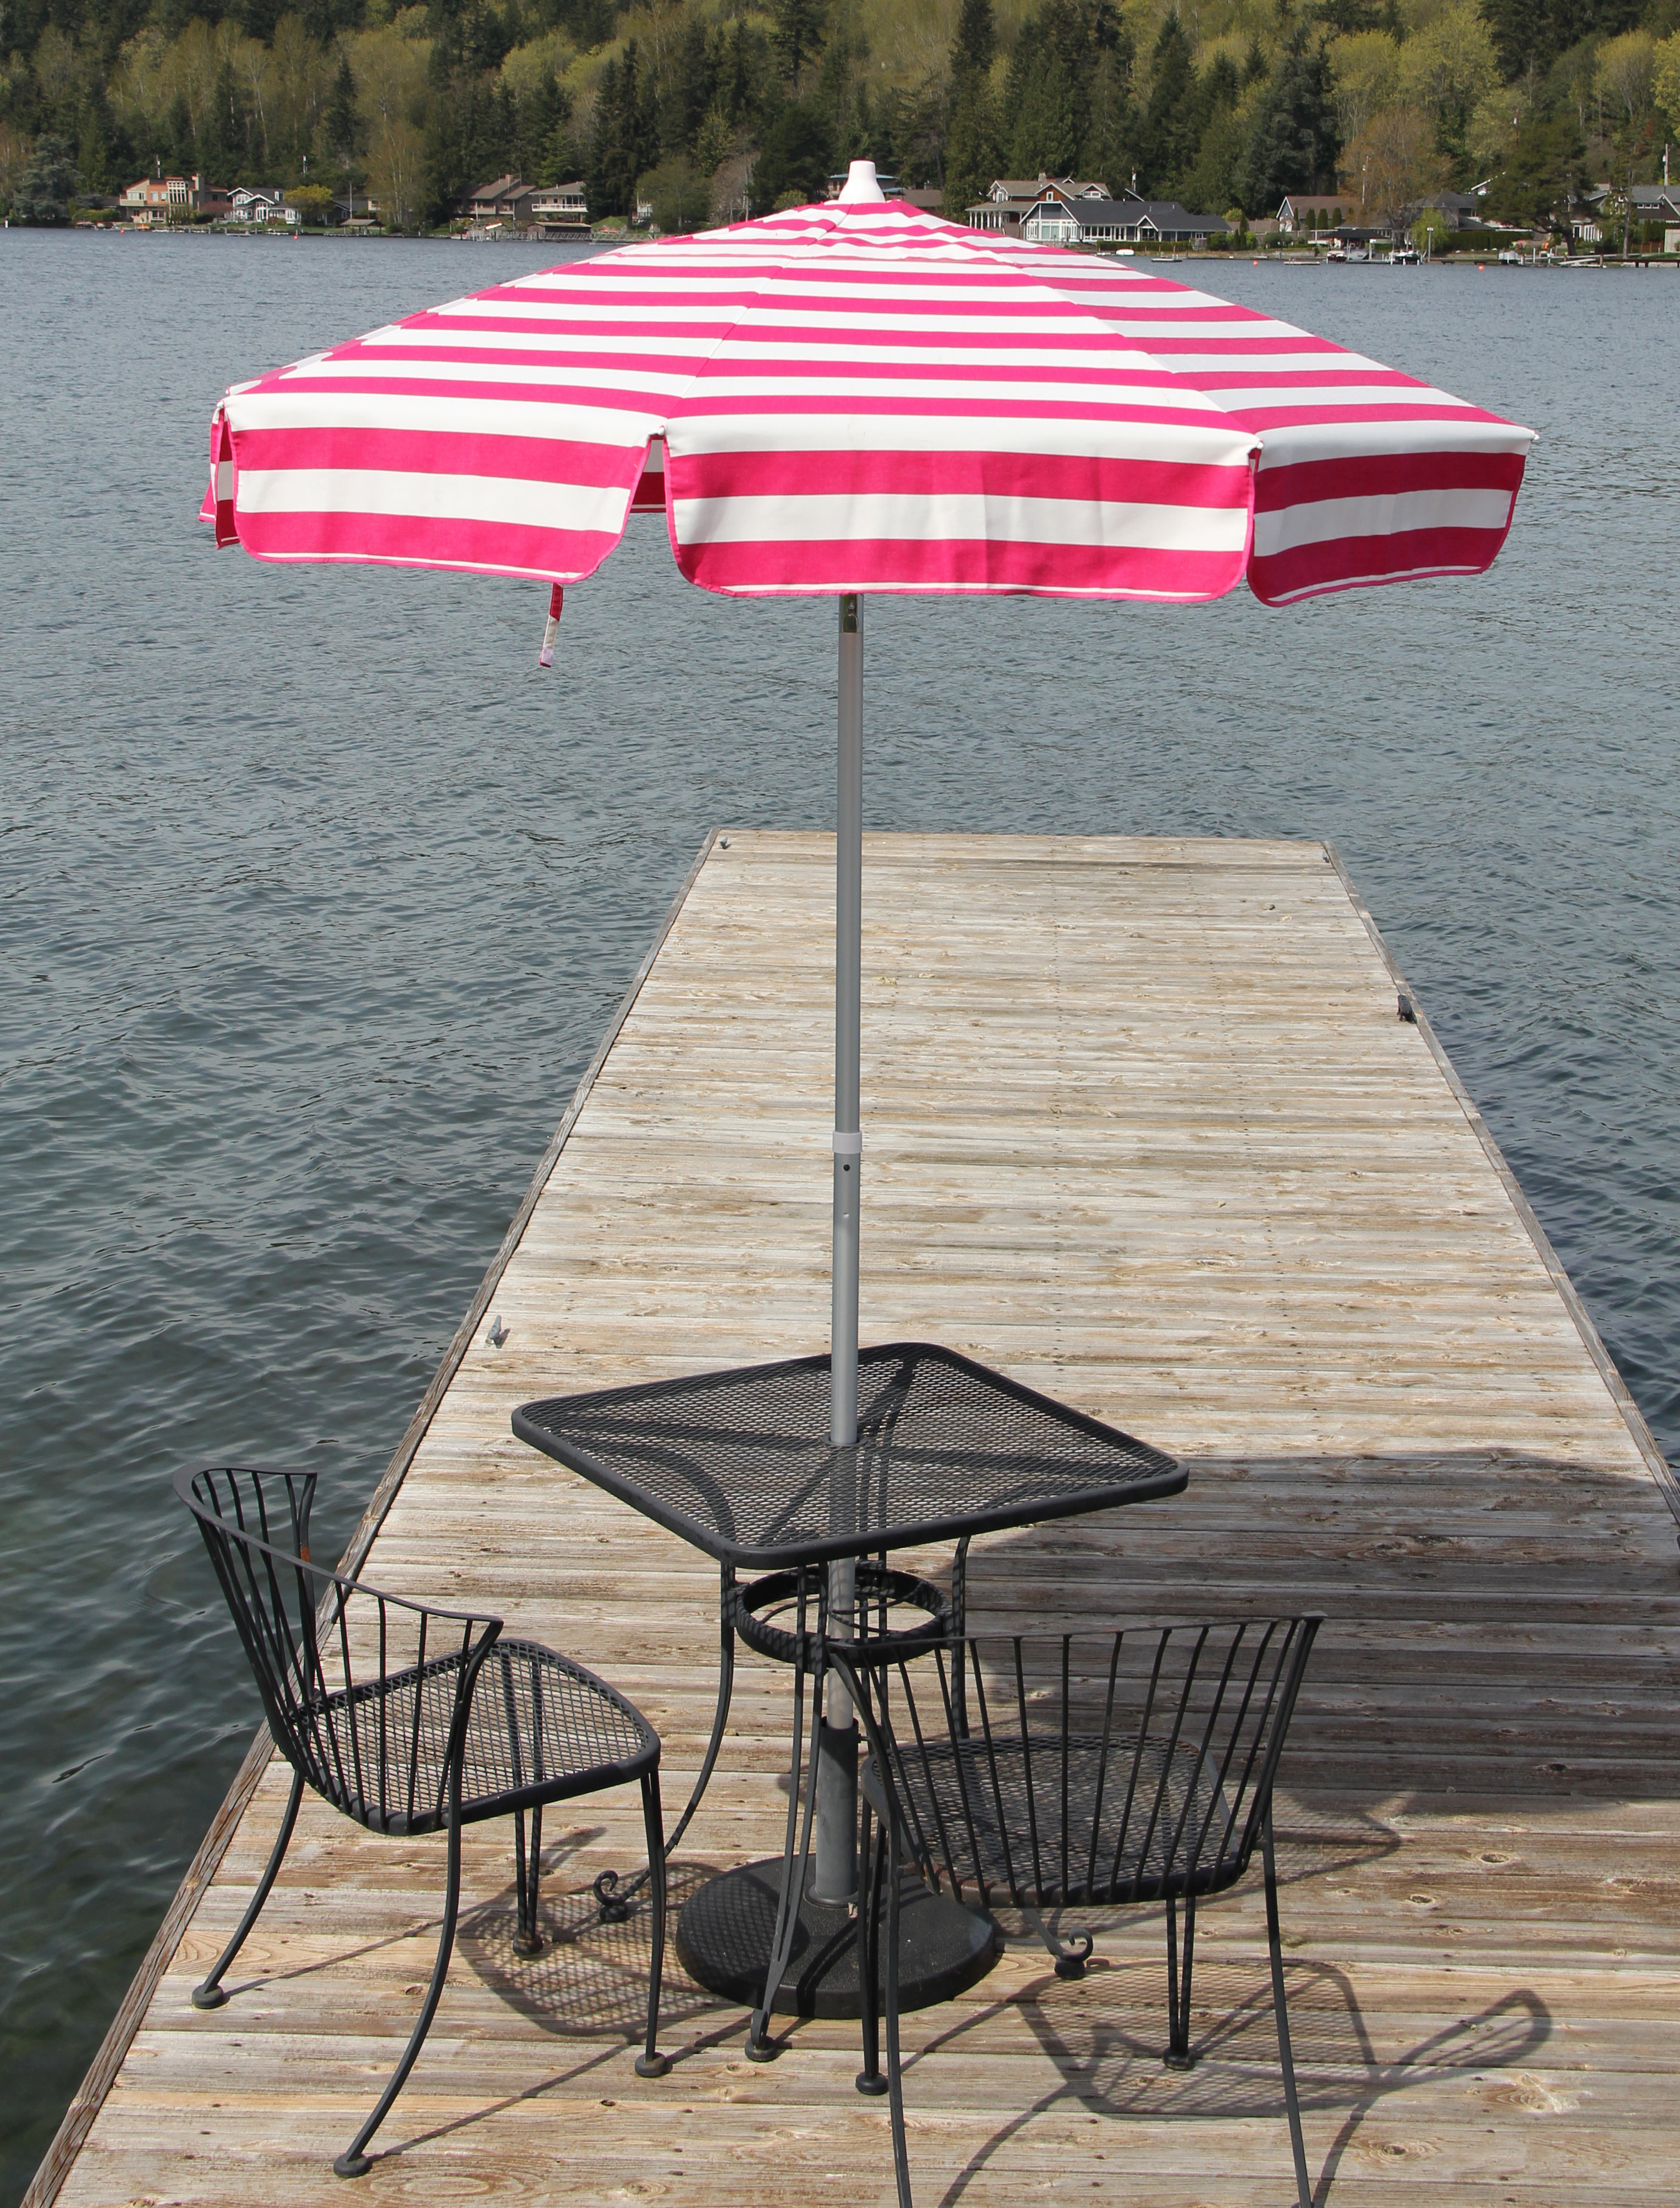 Italian 6' Market Umbrella Regarding Well Liked Italian Drape Umbrellas (Gallery 20 of 20)